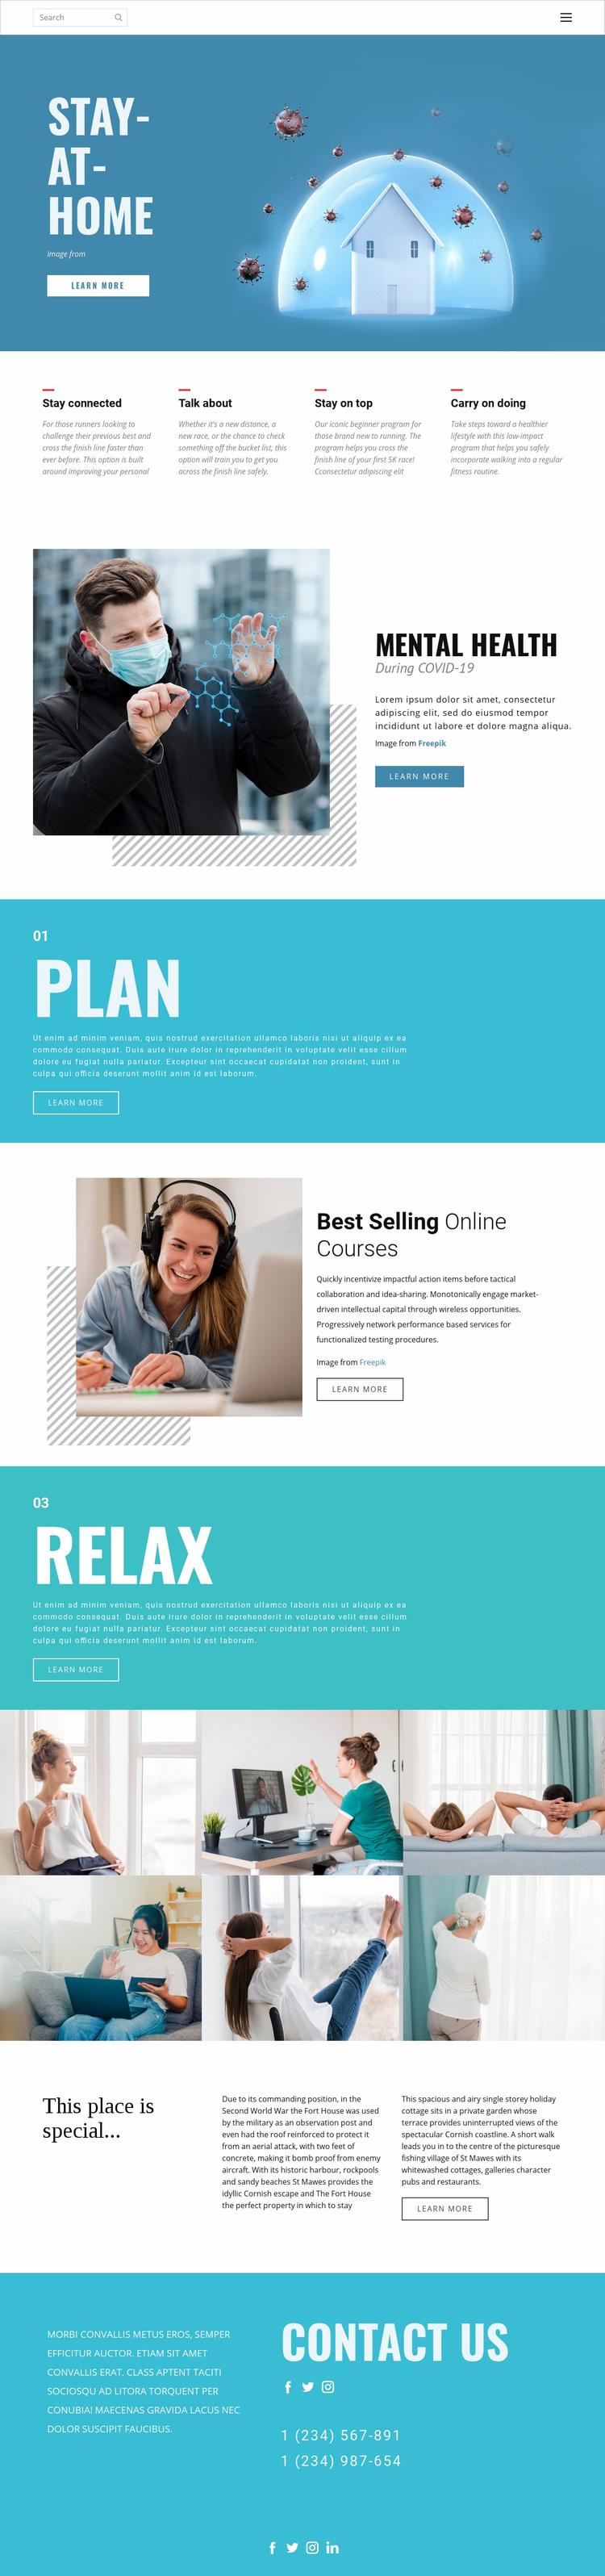 Stay-at-home medicine Web Page Designer